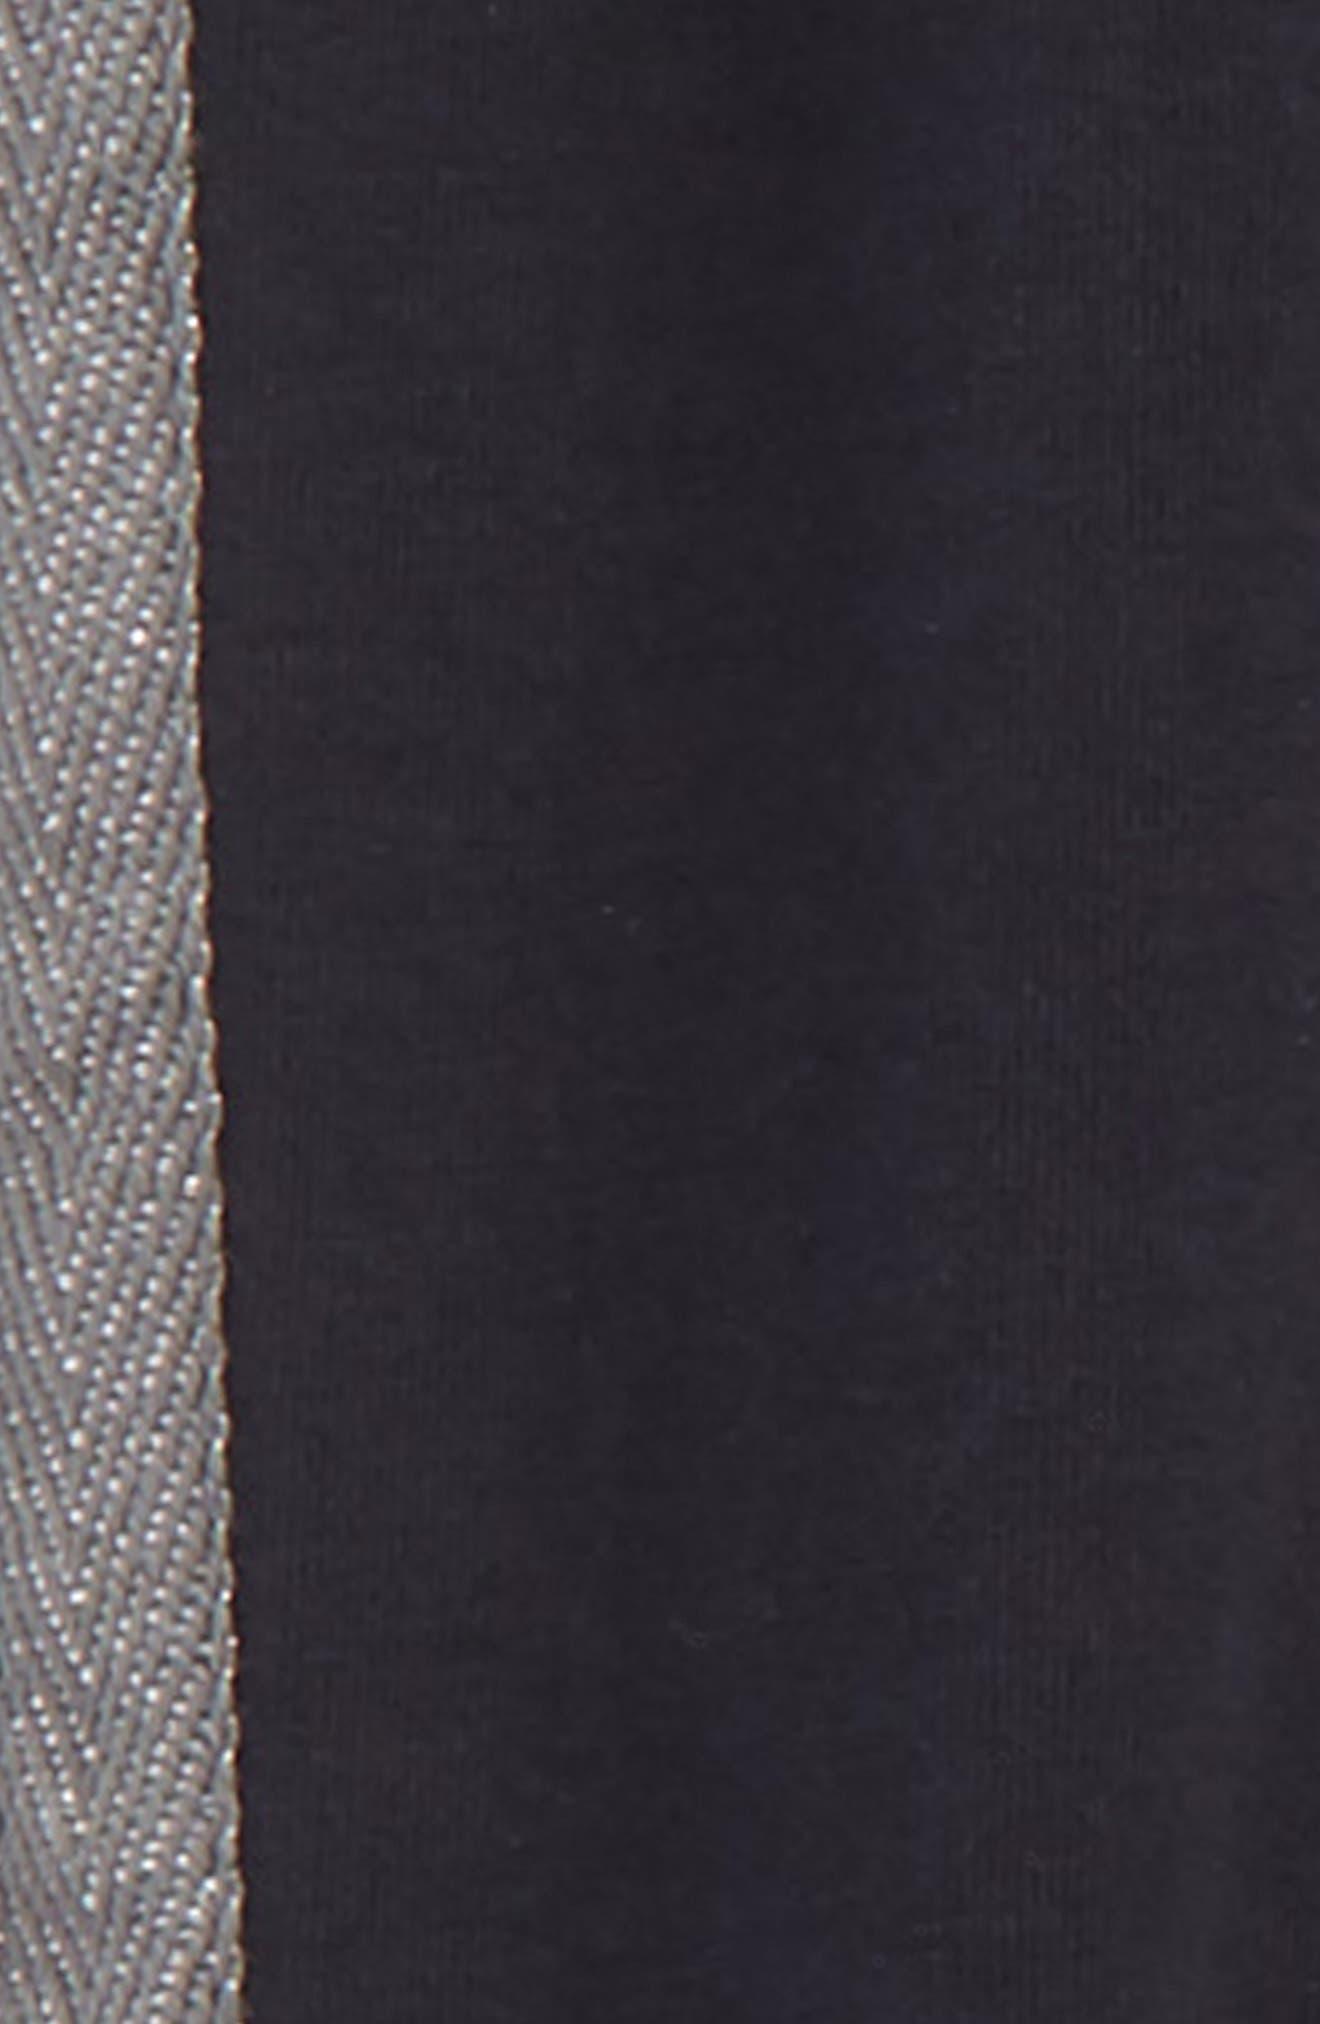 Alternate Image 2  - Tea Collection Tuxedo Stripe Jogger Pants (Toddler Girls, Little Girls & Big Girls)